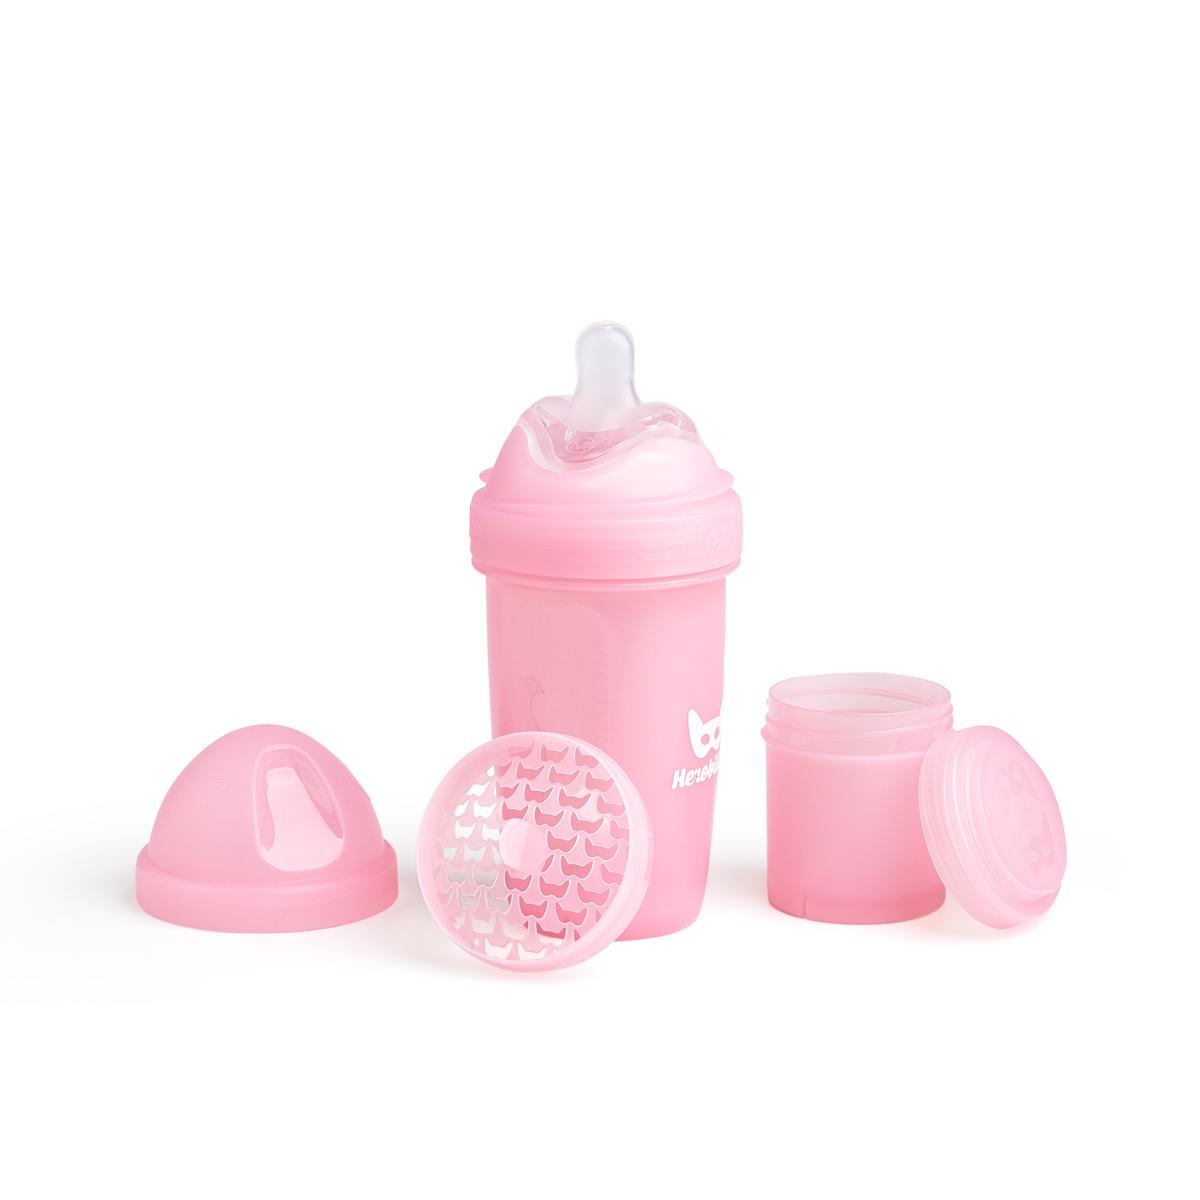 Herobility - butelka antykolkowa Herobottle 240 ml, różowa + smoczek M (2 m+)